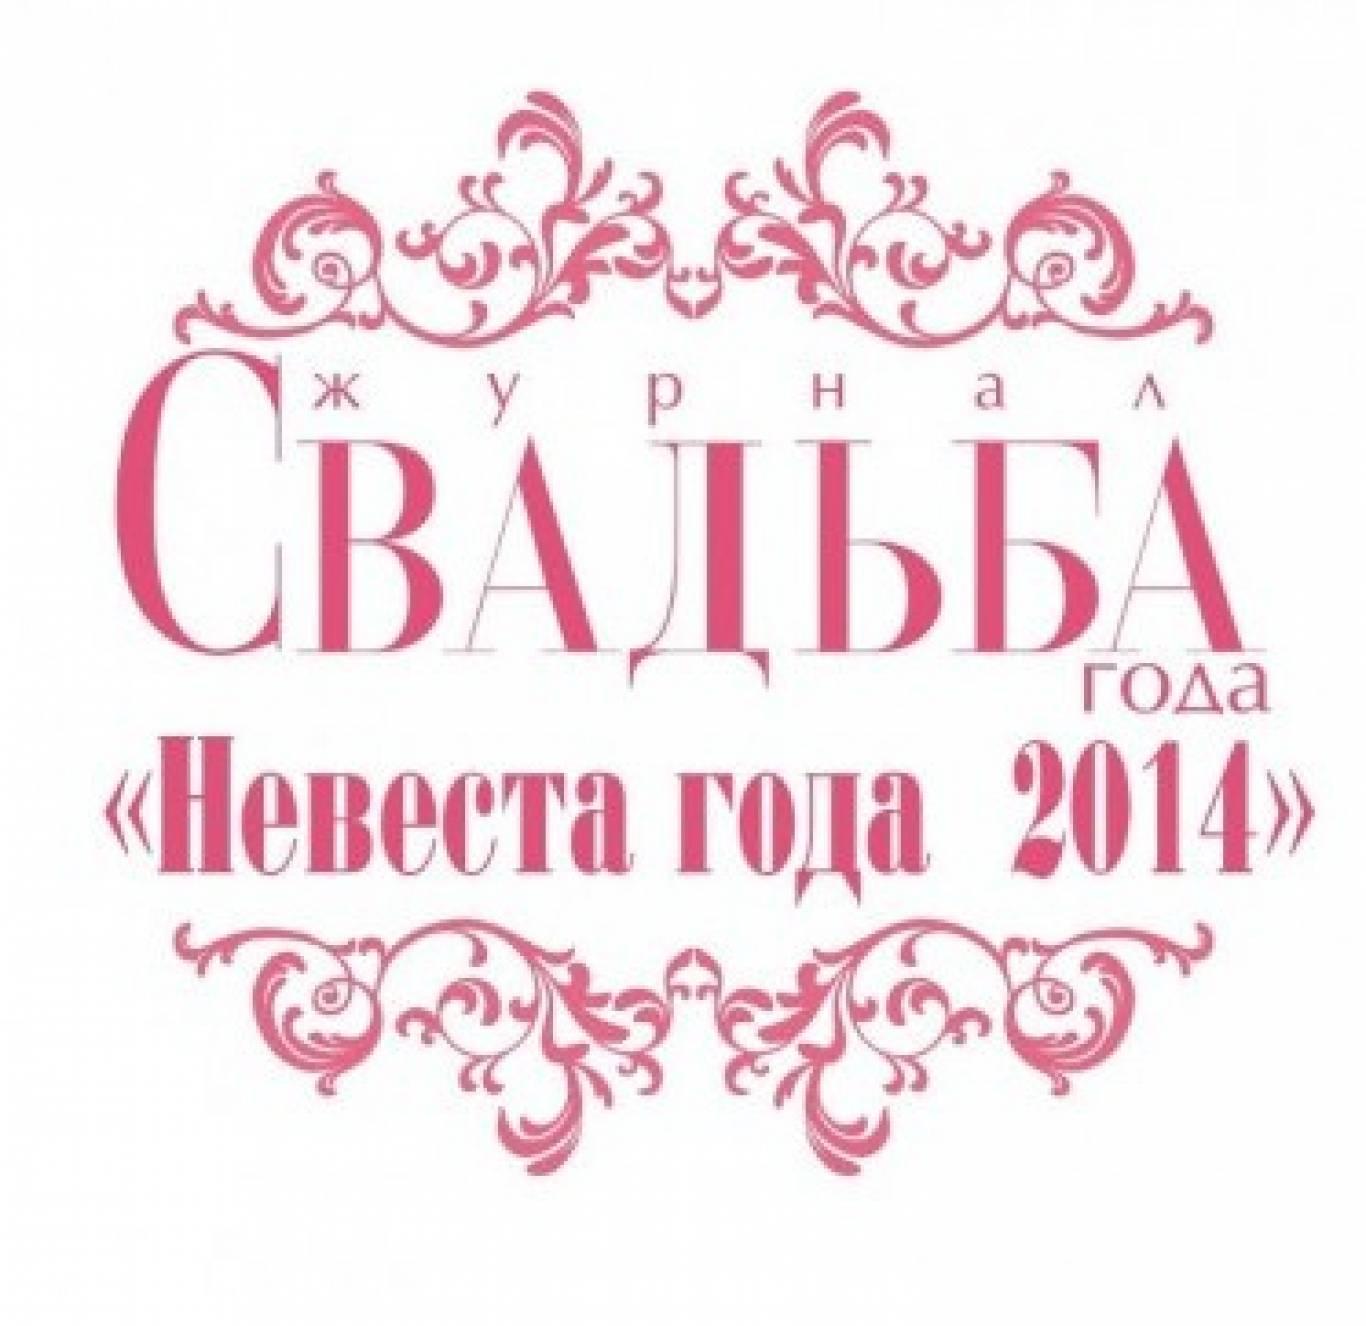 Фінал конкурсу «Наречена року 2014»